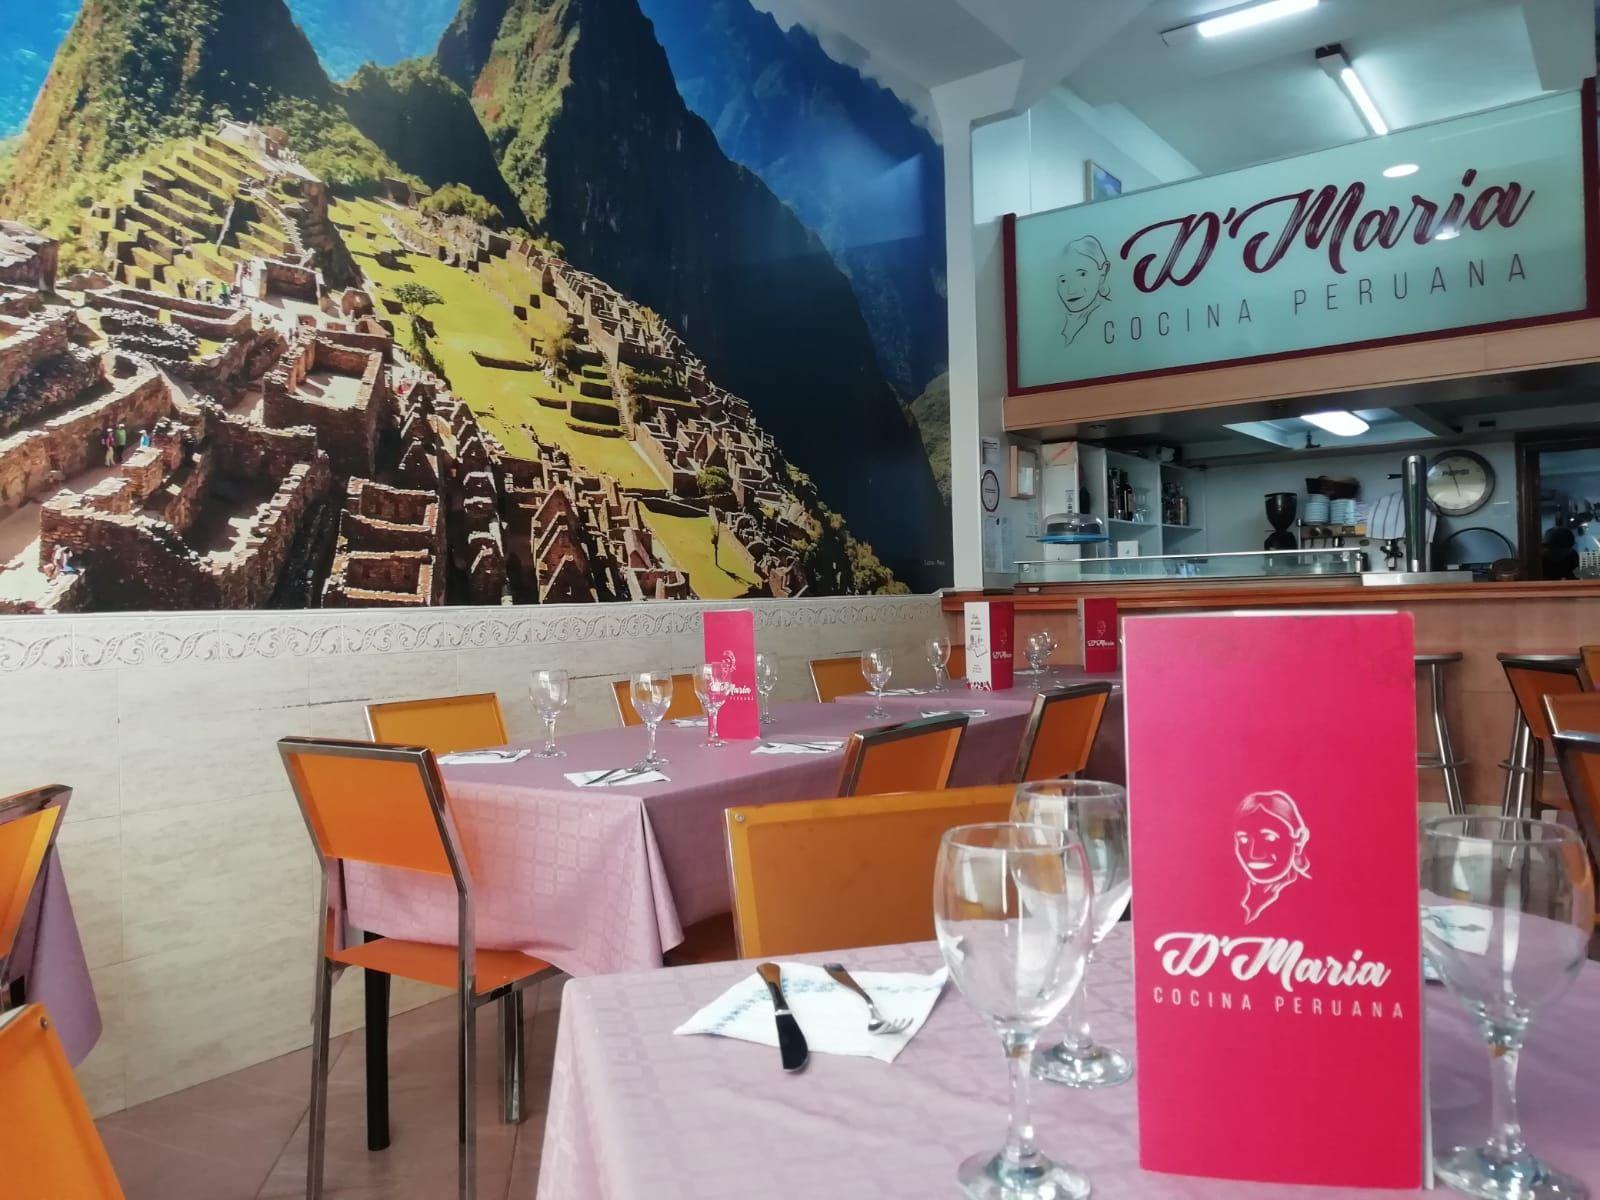 Foto 135 de Cocina peruana en  | TIKA MARIYA